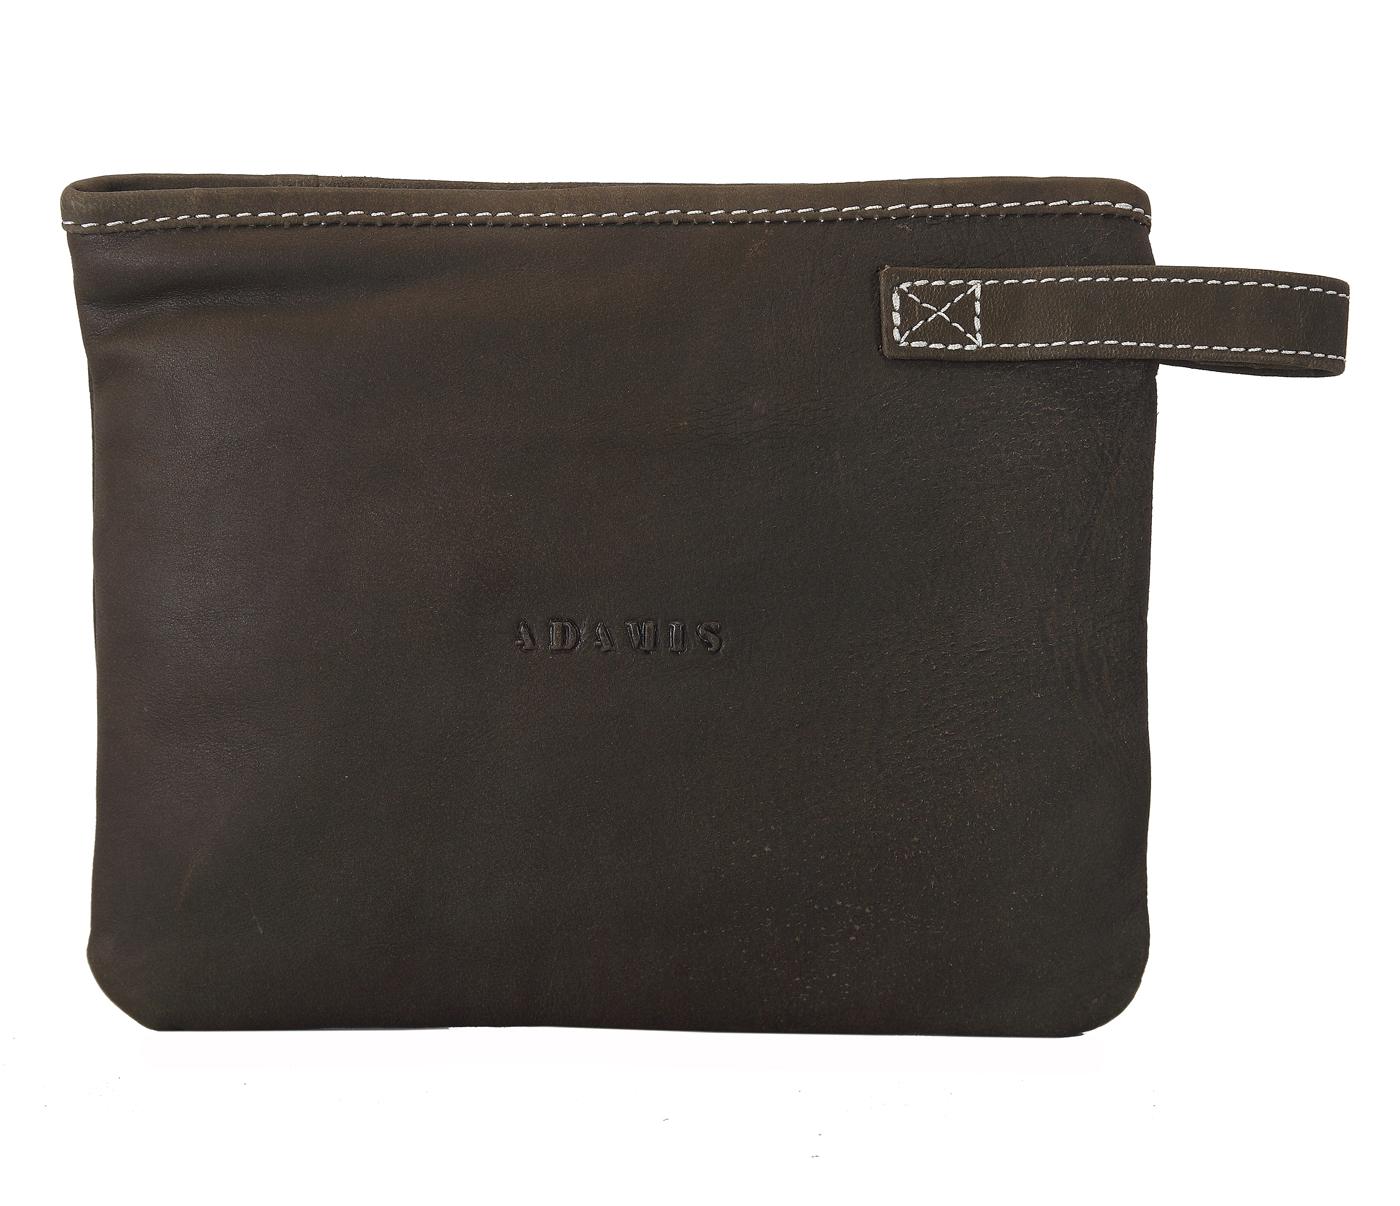 W227--Unisex multi purpose pouch in Genuine Leather - Brown.